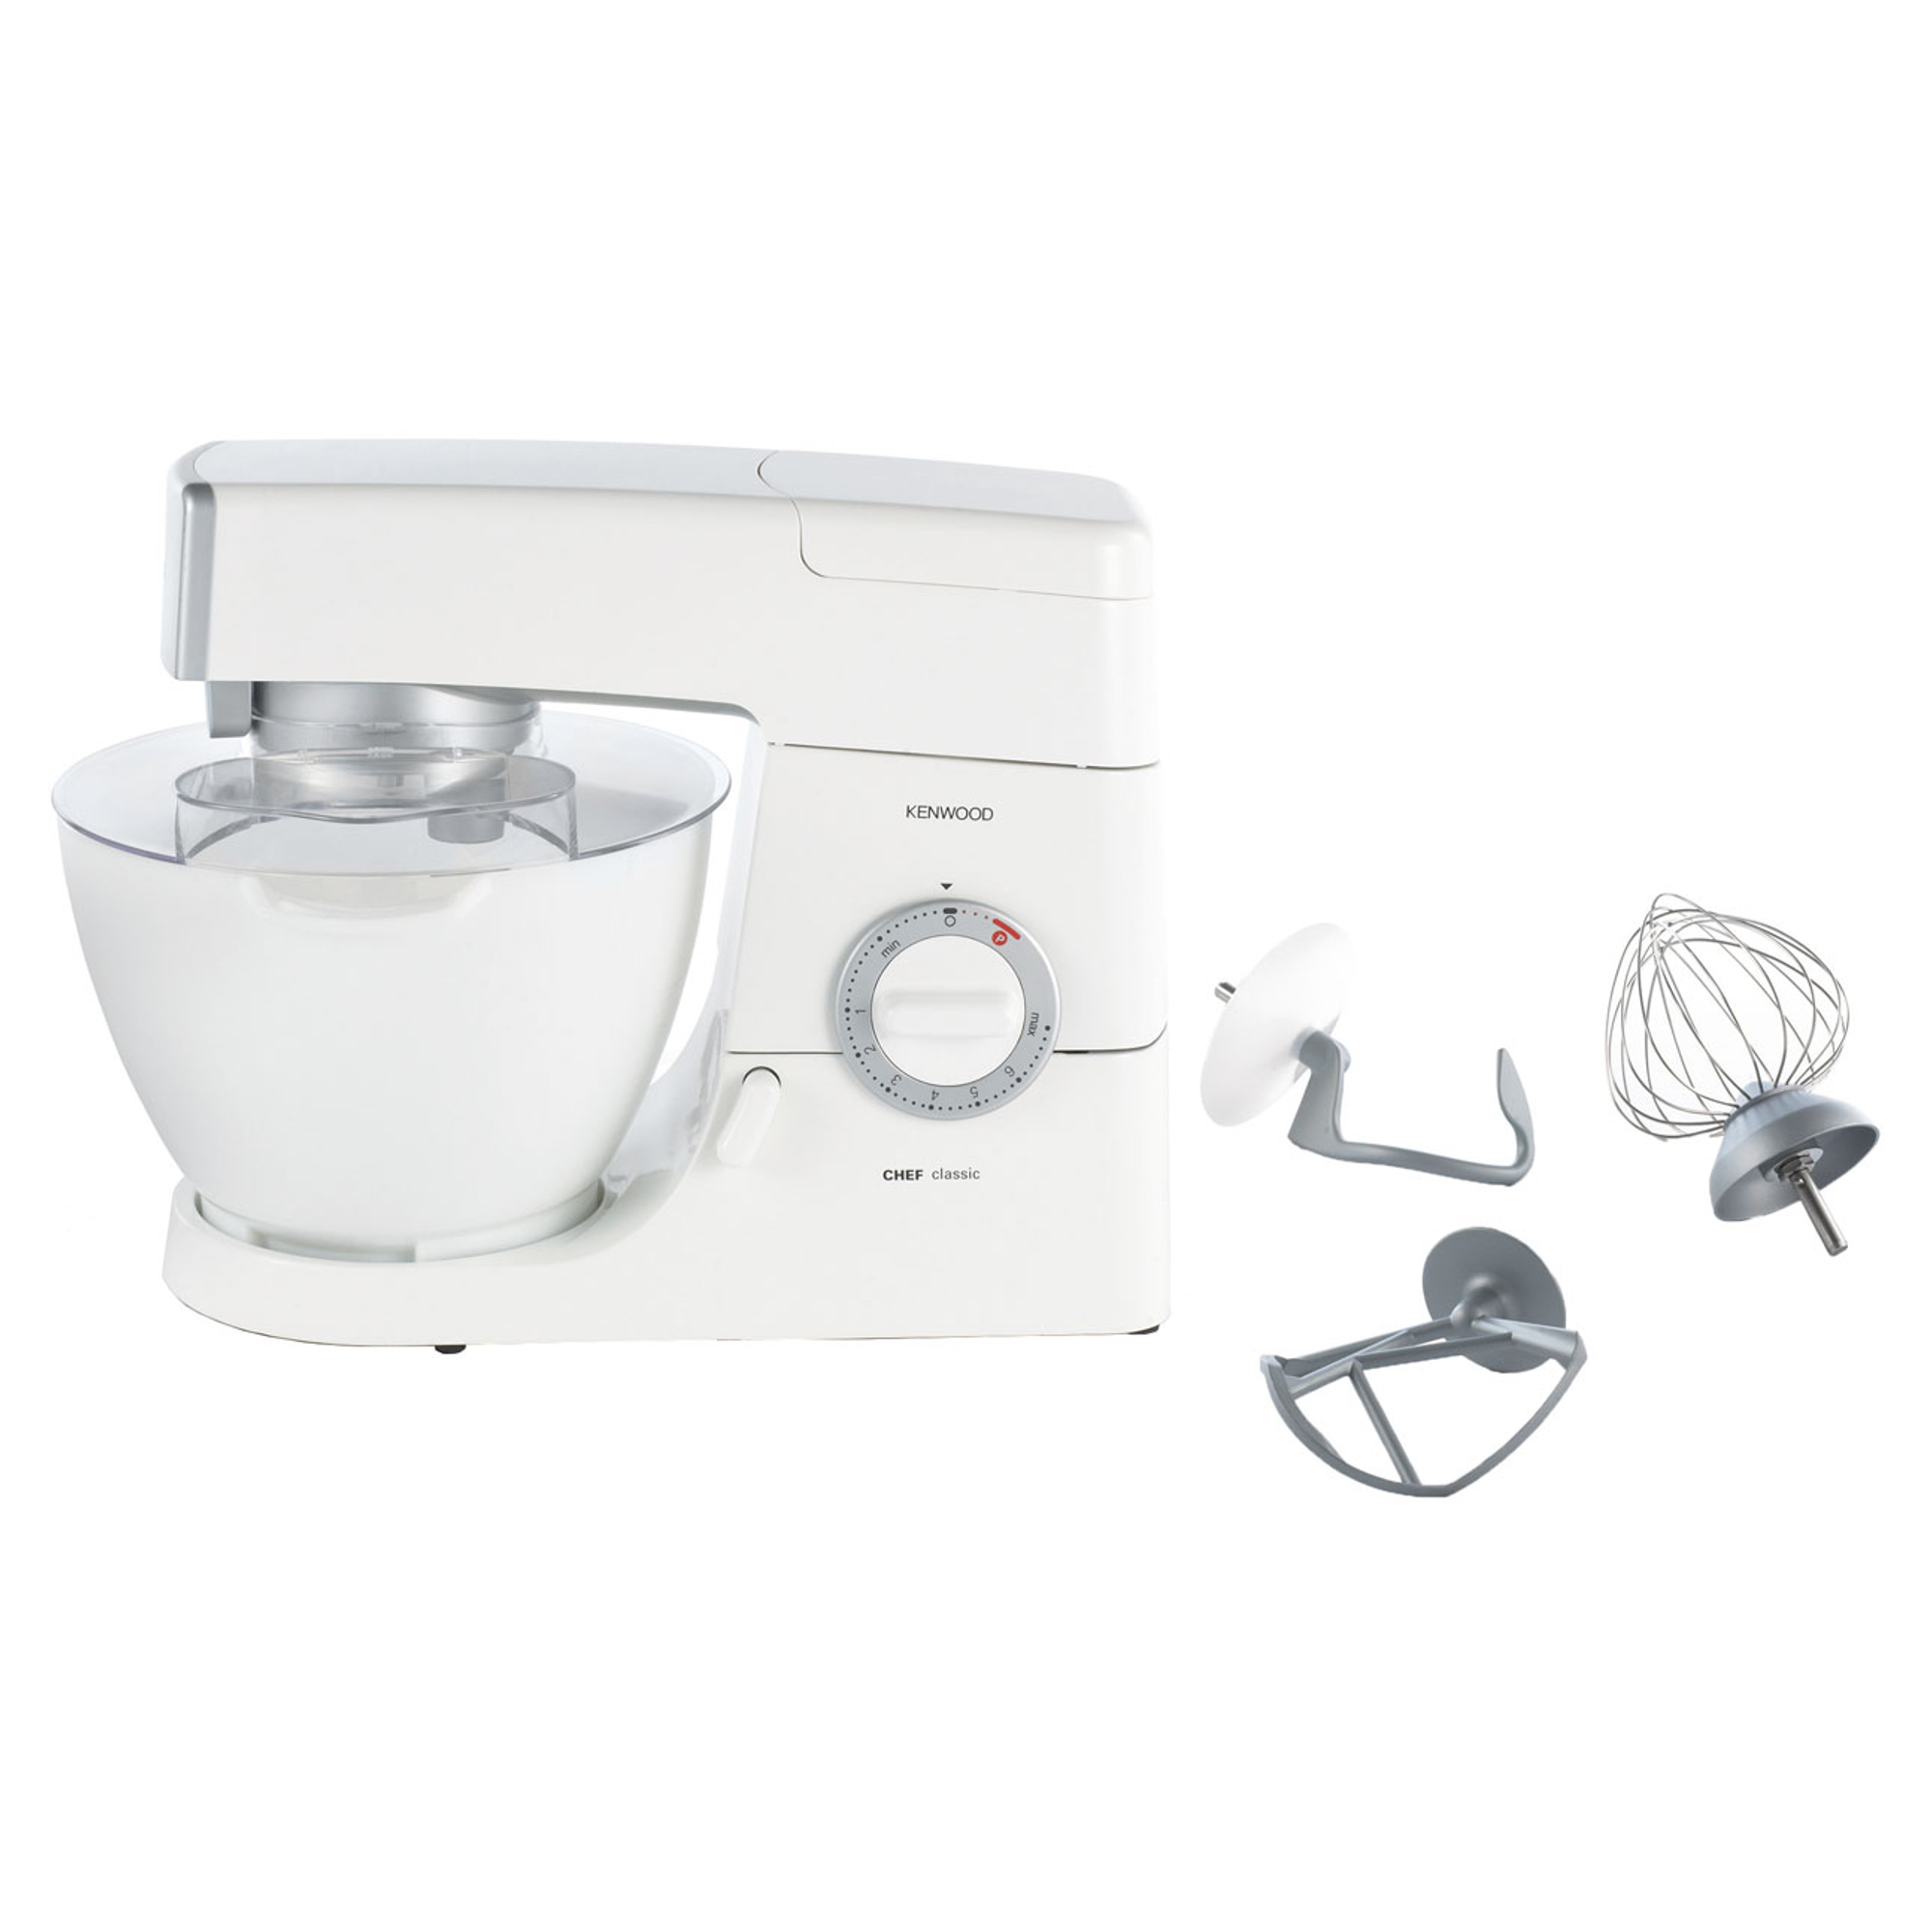 Km330 Kenwood Chef Classic 800w 4 6 Litre White Kitchen Mixer